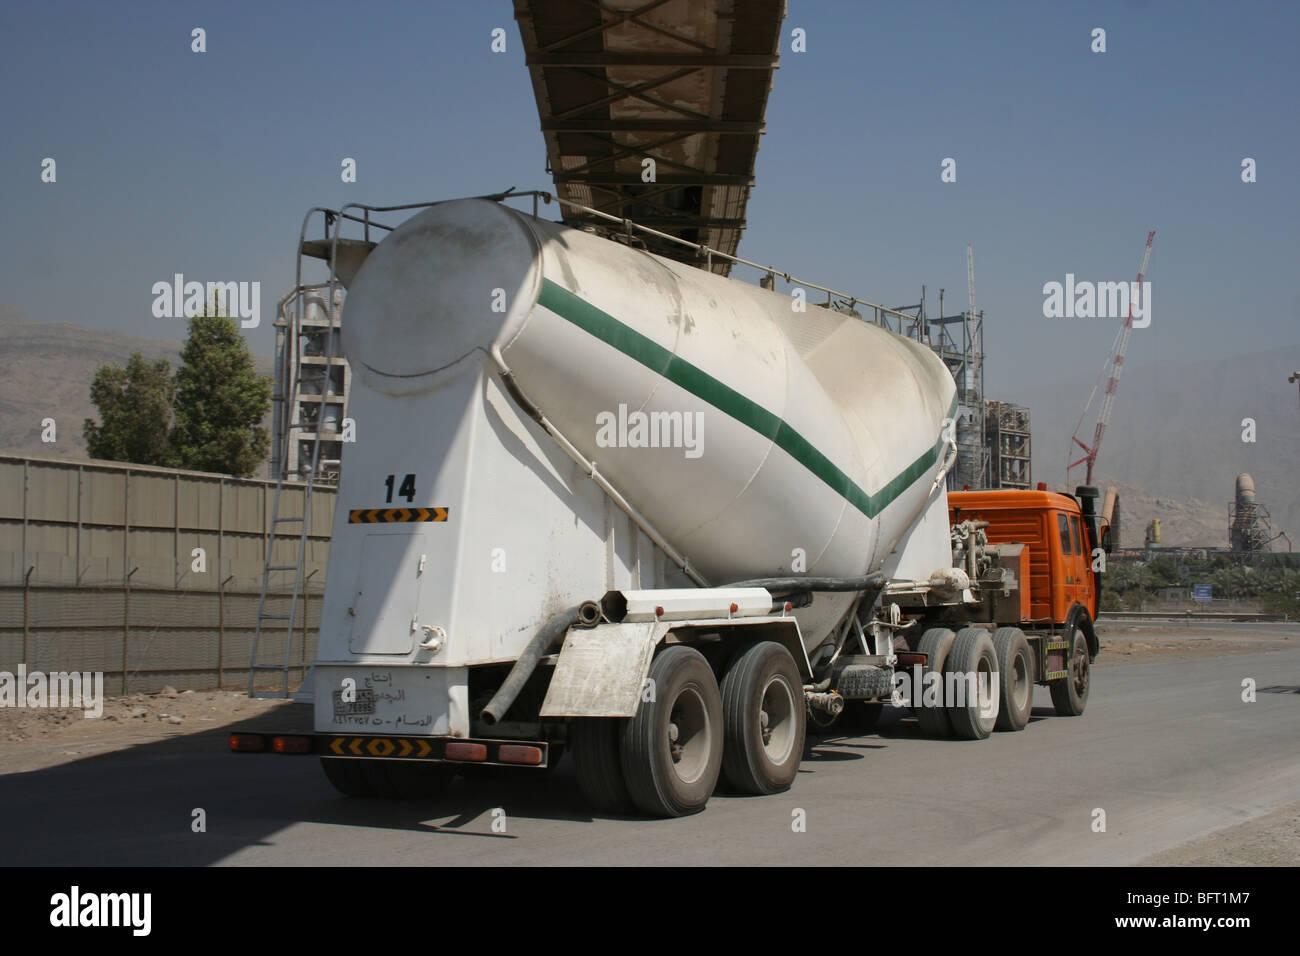 Ras Al Khaimah Cement Truck and Factory Uae Stock Photo